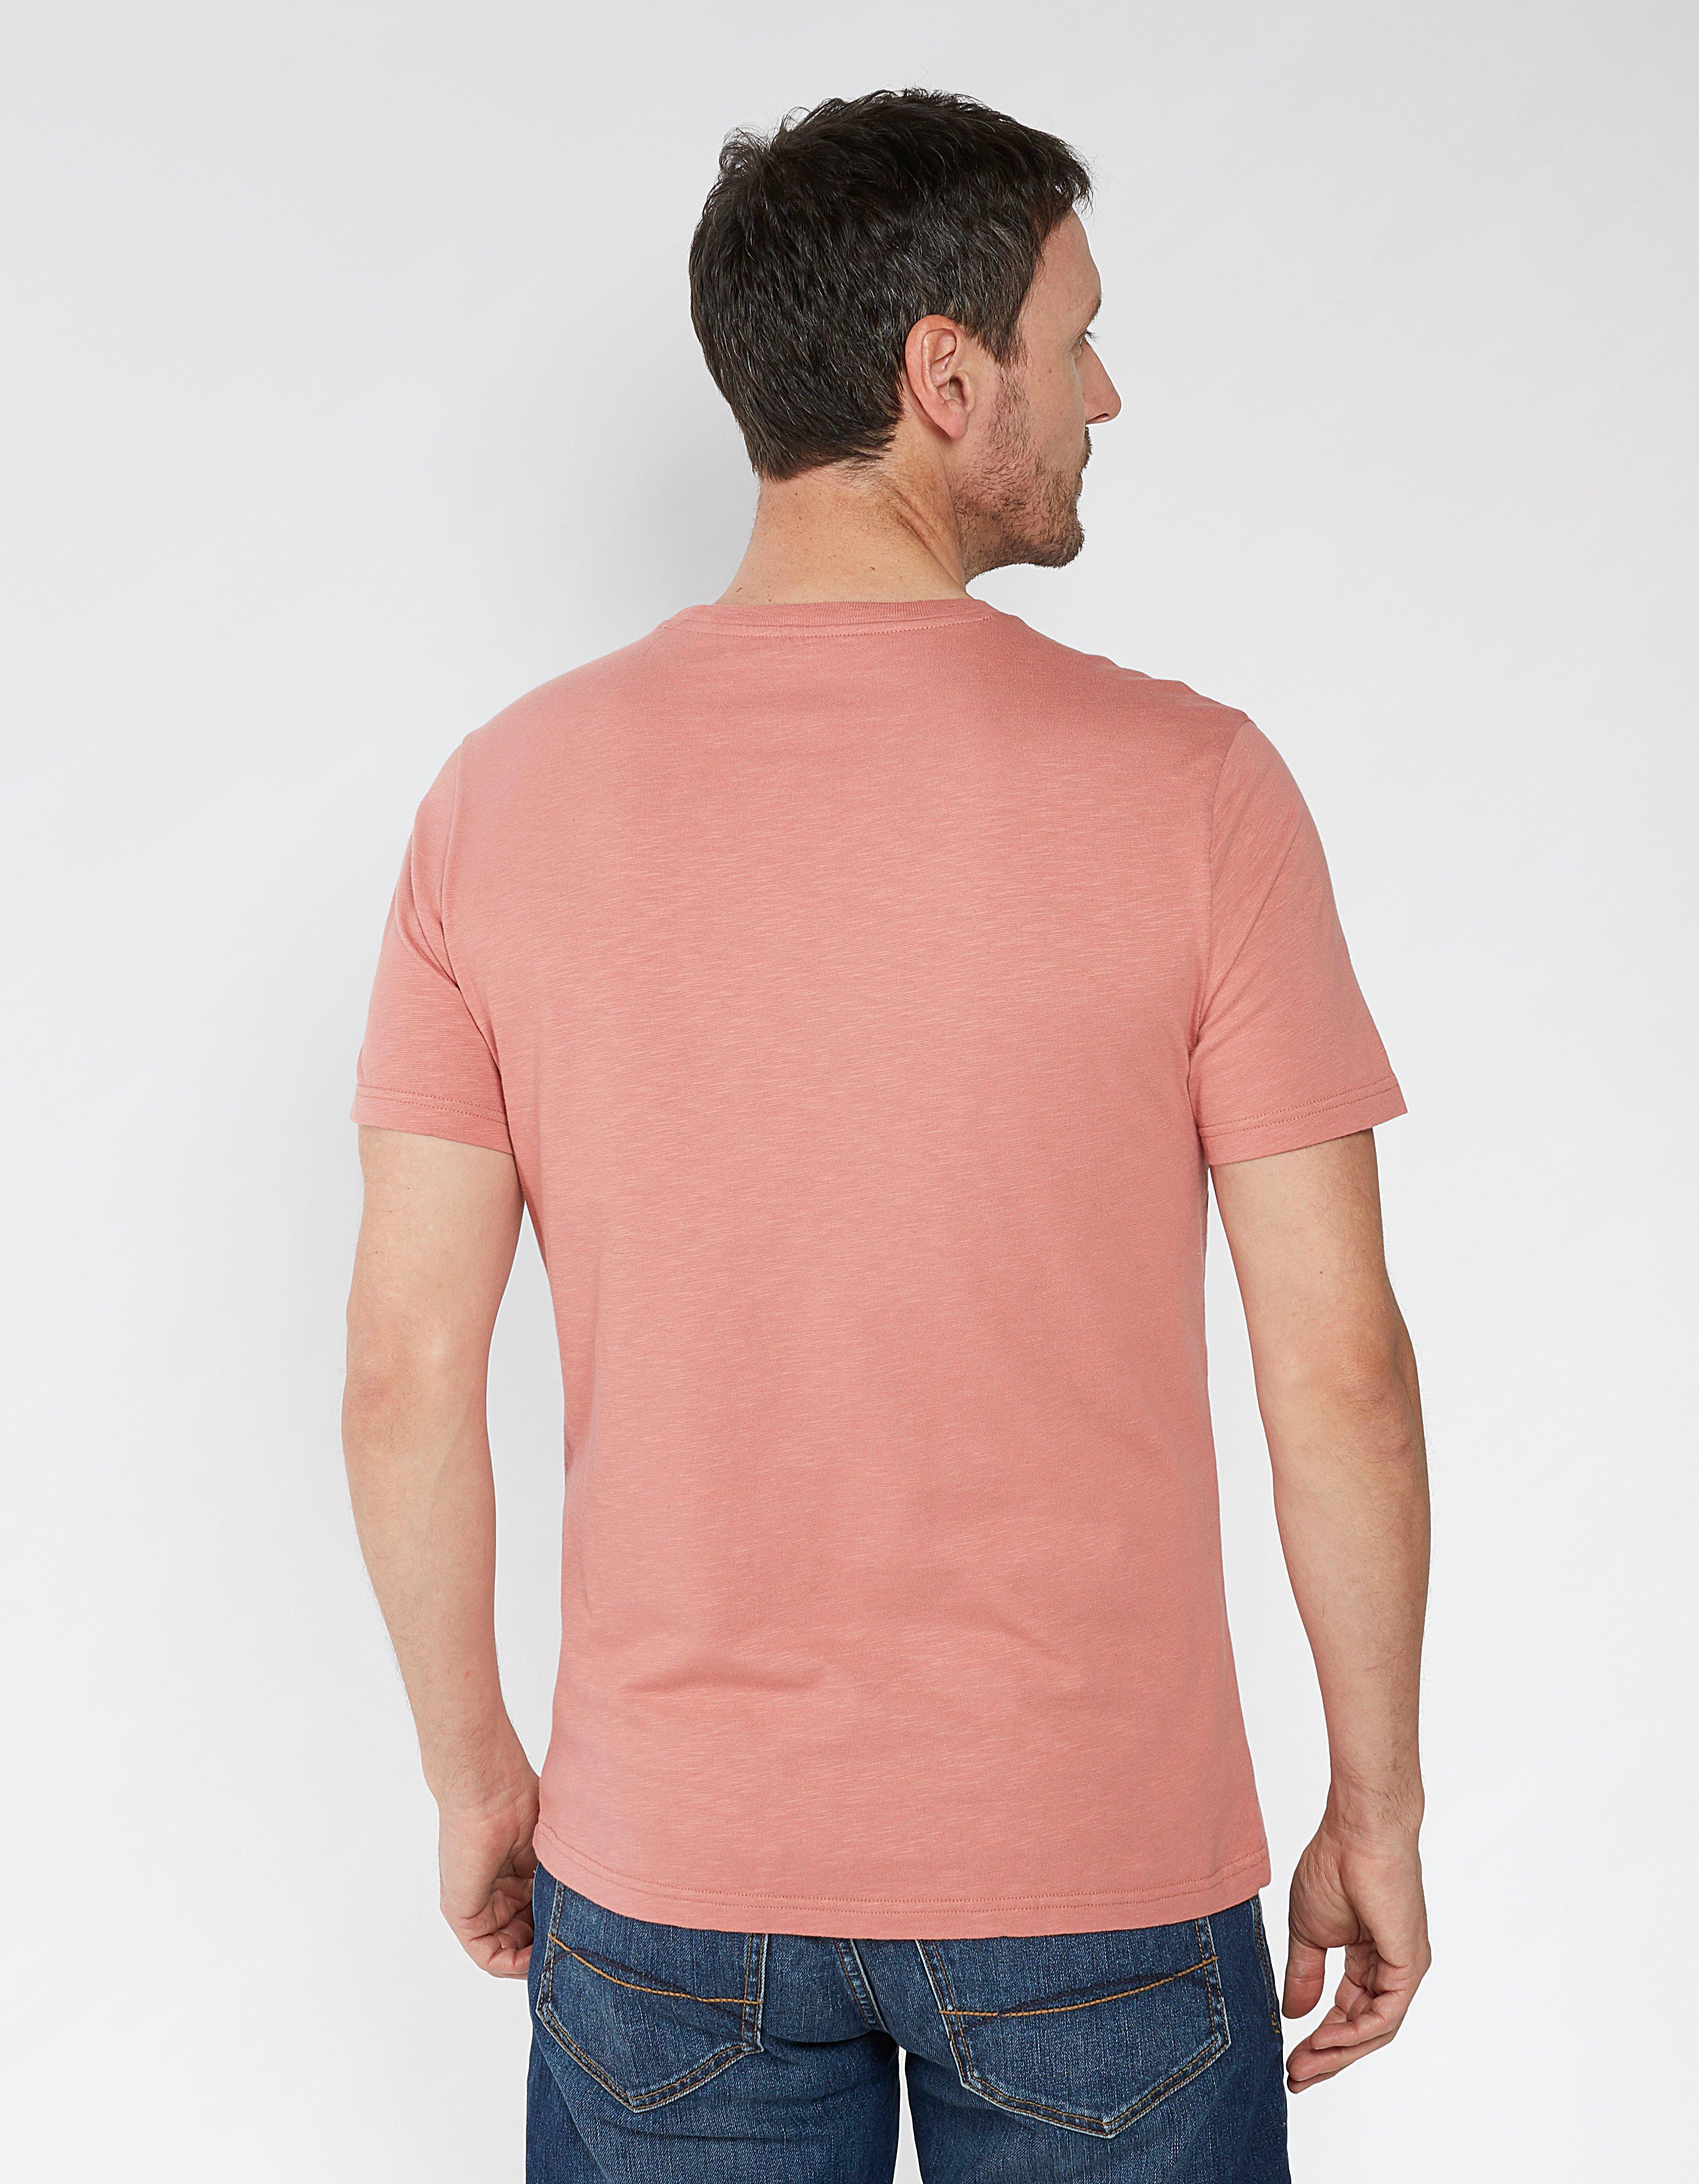 Give Me a Break Organic Cotton Graphic T-Shirt